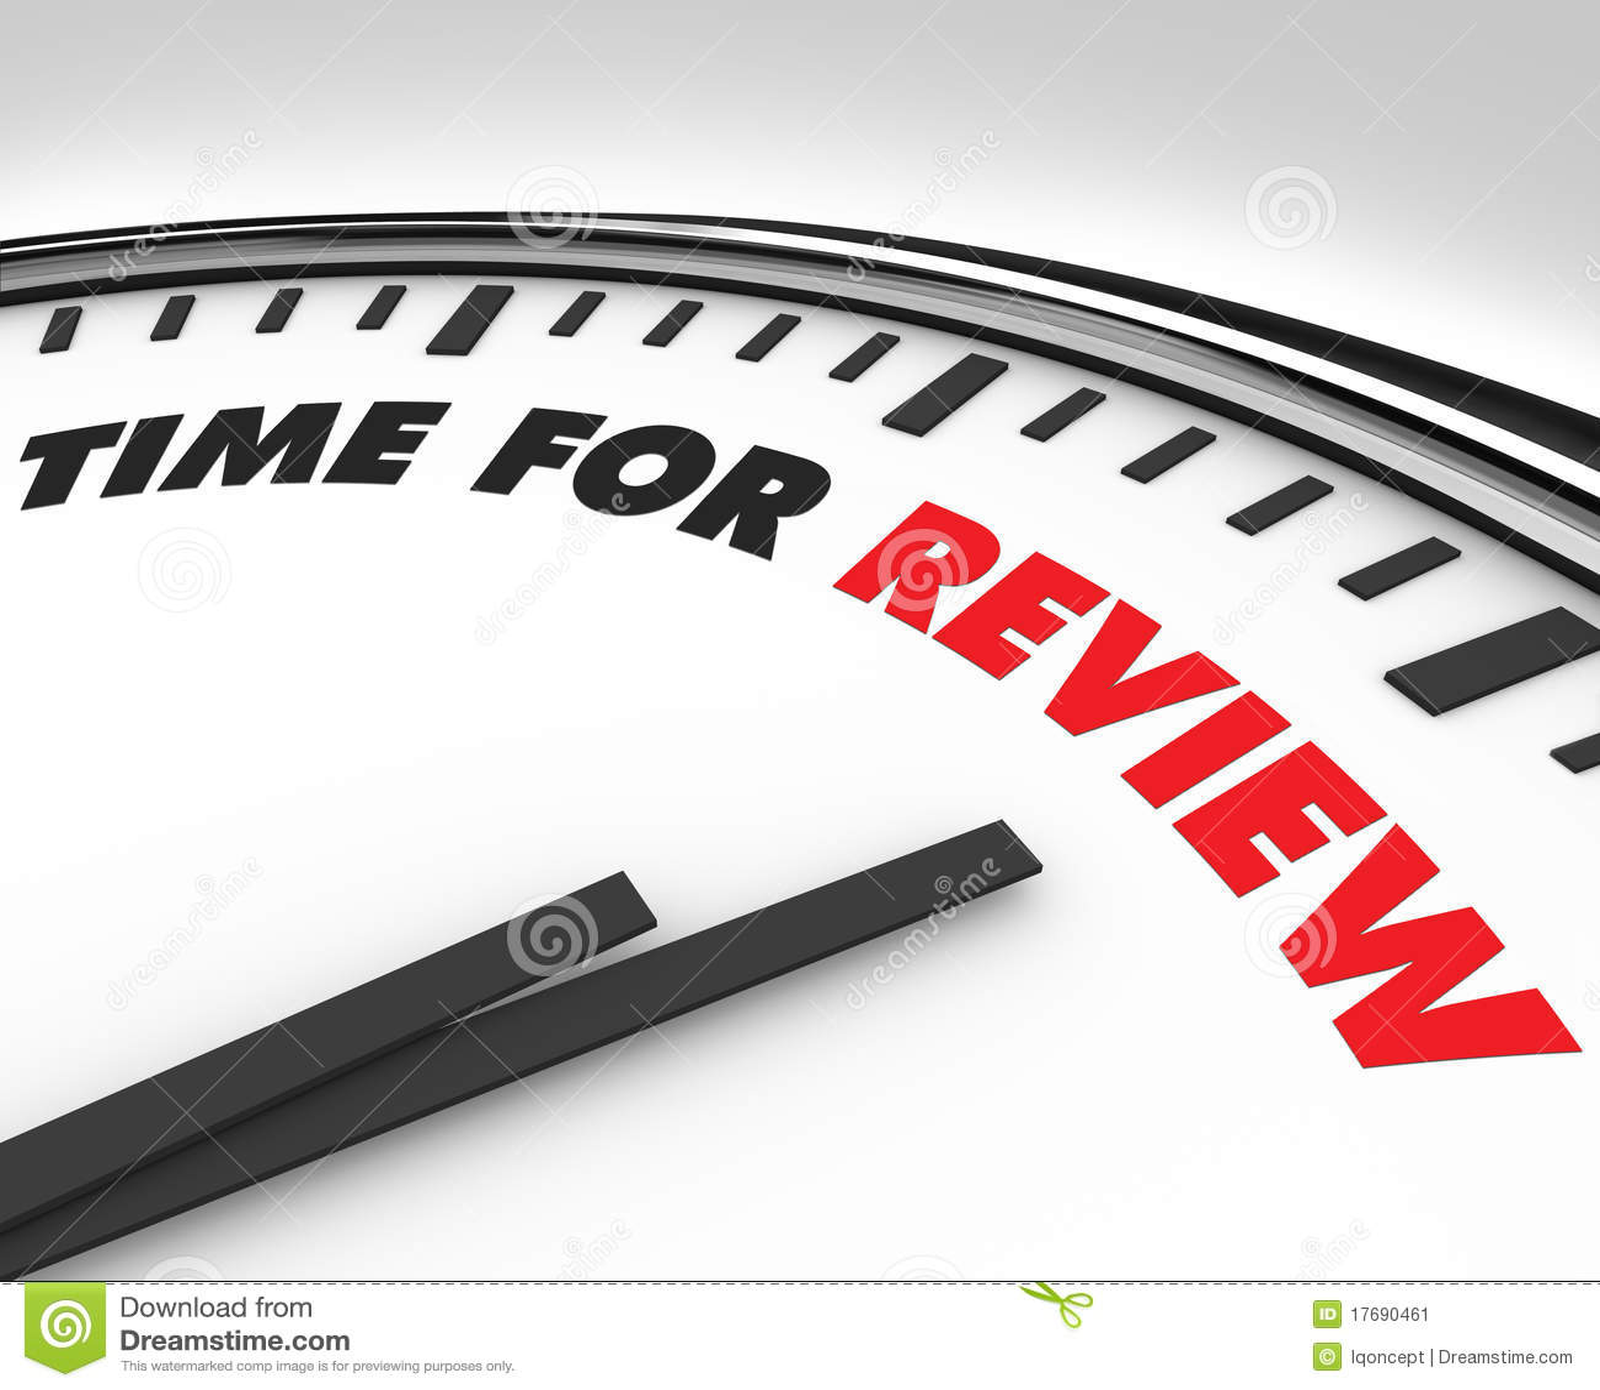 17690461 Grading Review Of For Illustration Illustration Stock Time - Clock